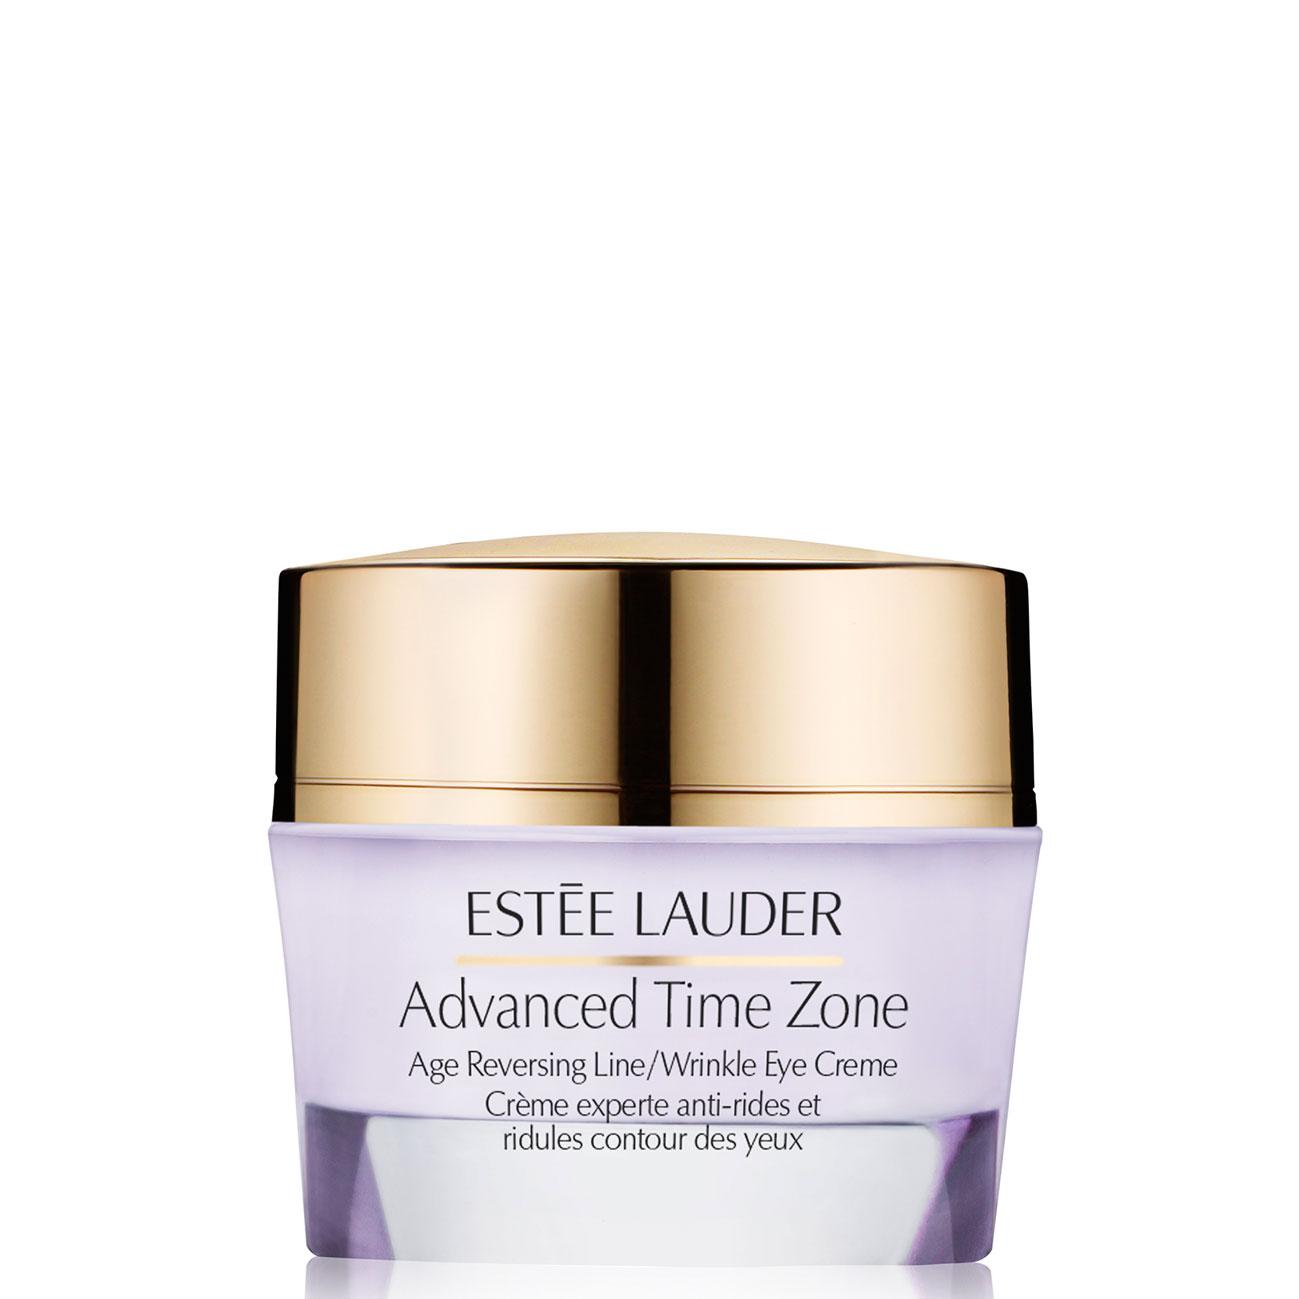 Afbeelding van Estée Lauder Advanced Time Zone Age Reversing Line/Wrinkle Eye Creme 15 ml